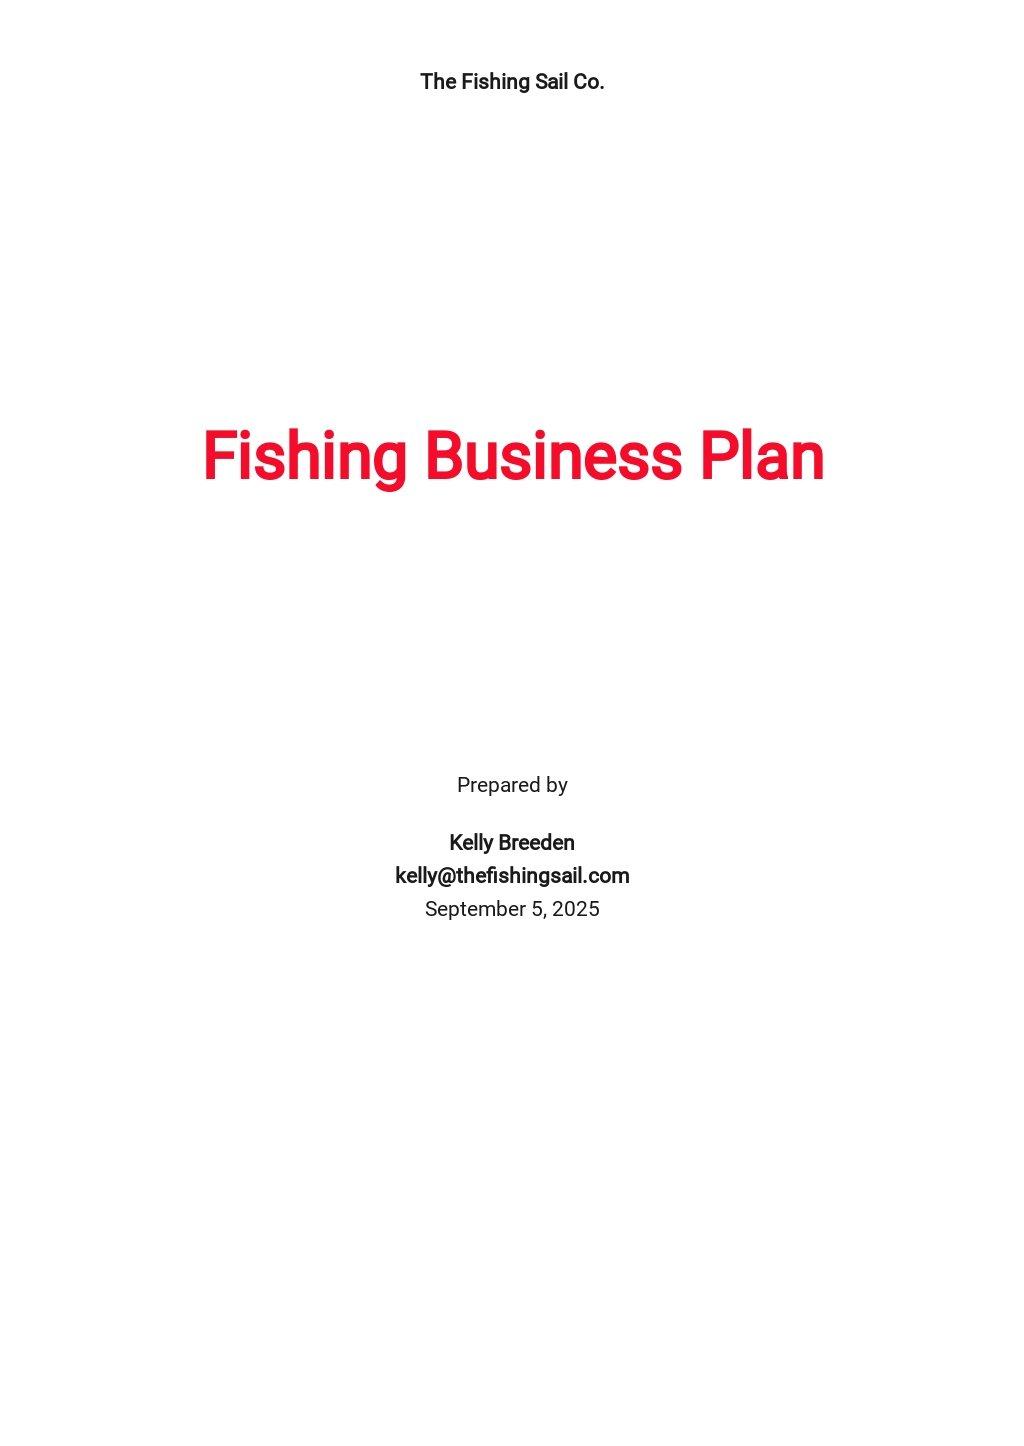 Fishing Business Plan Template